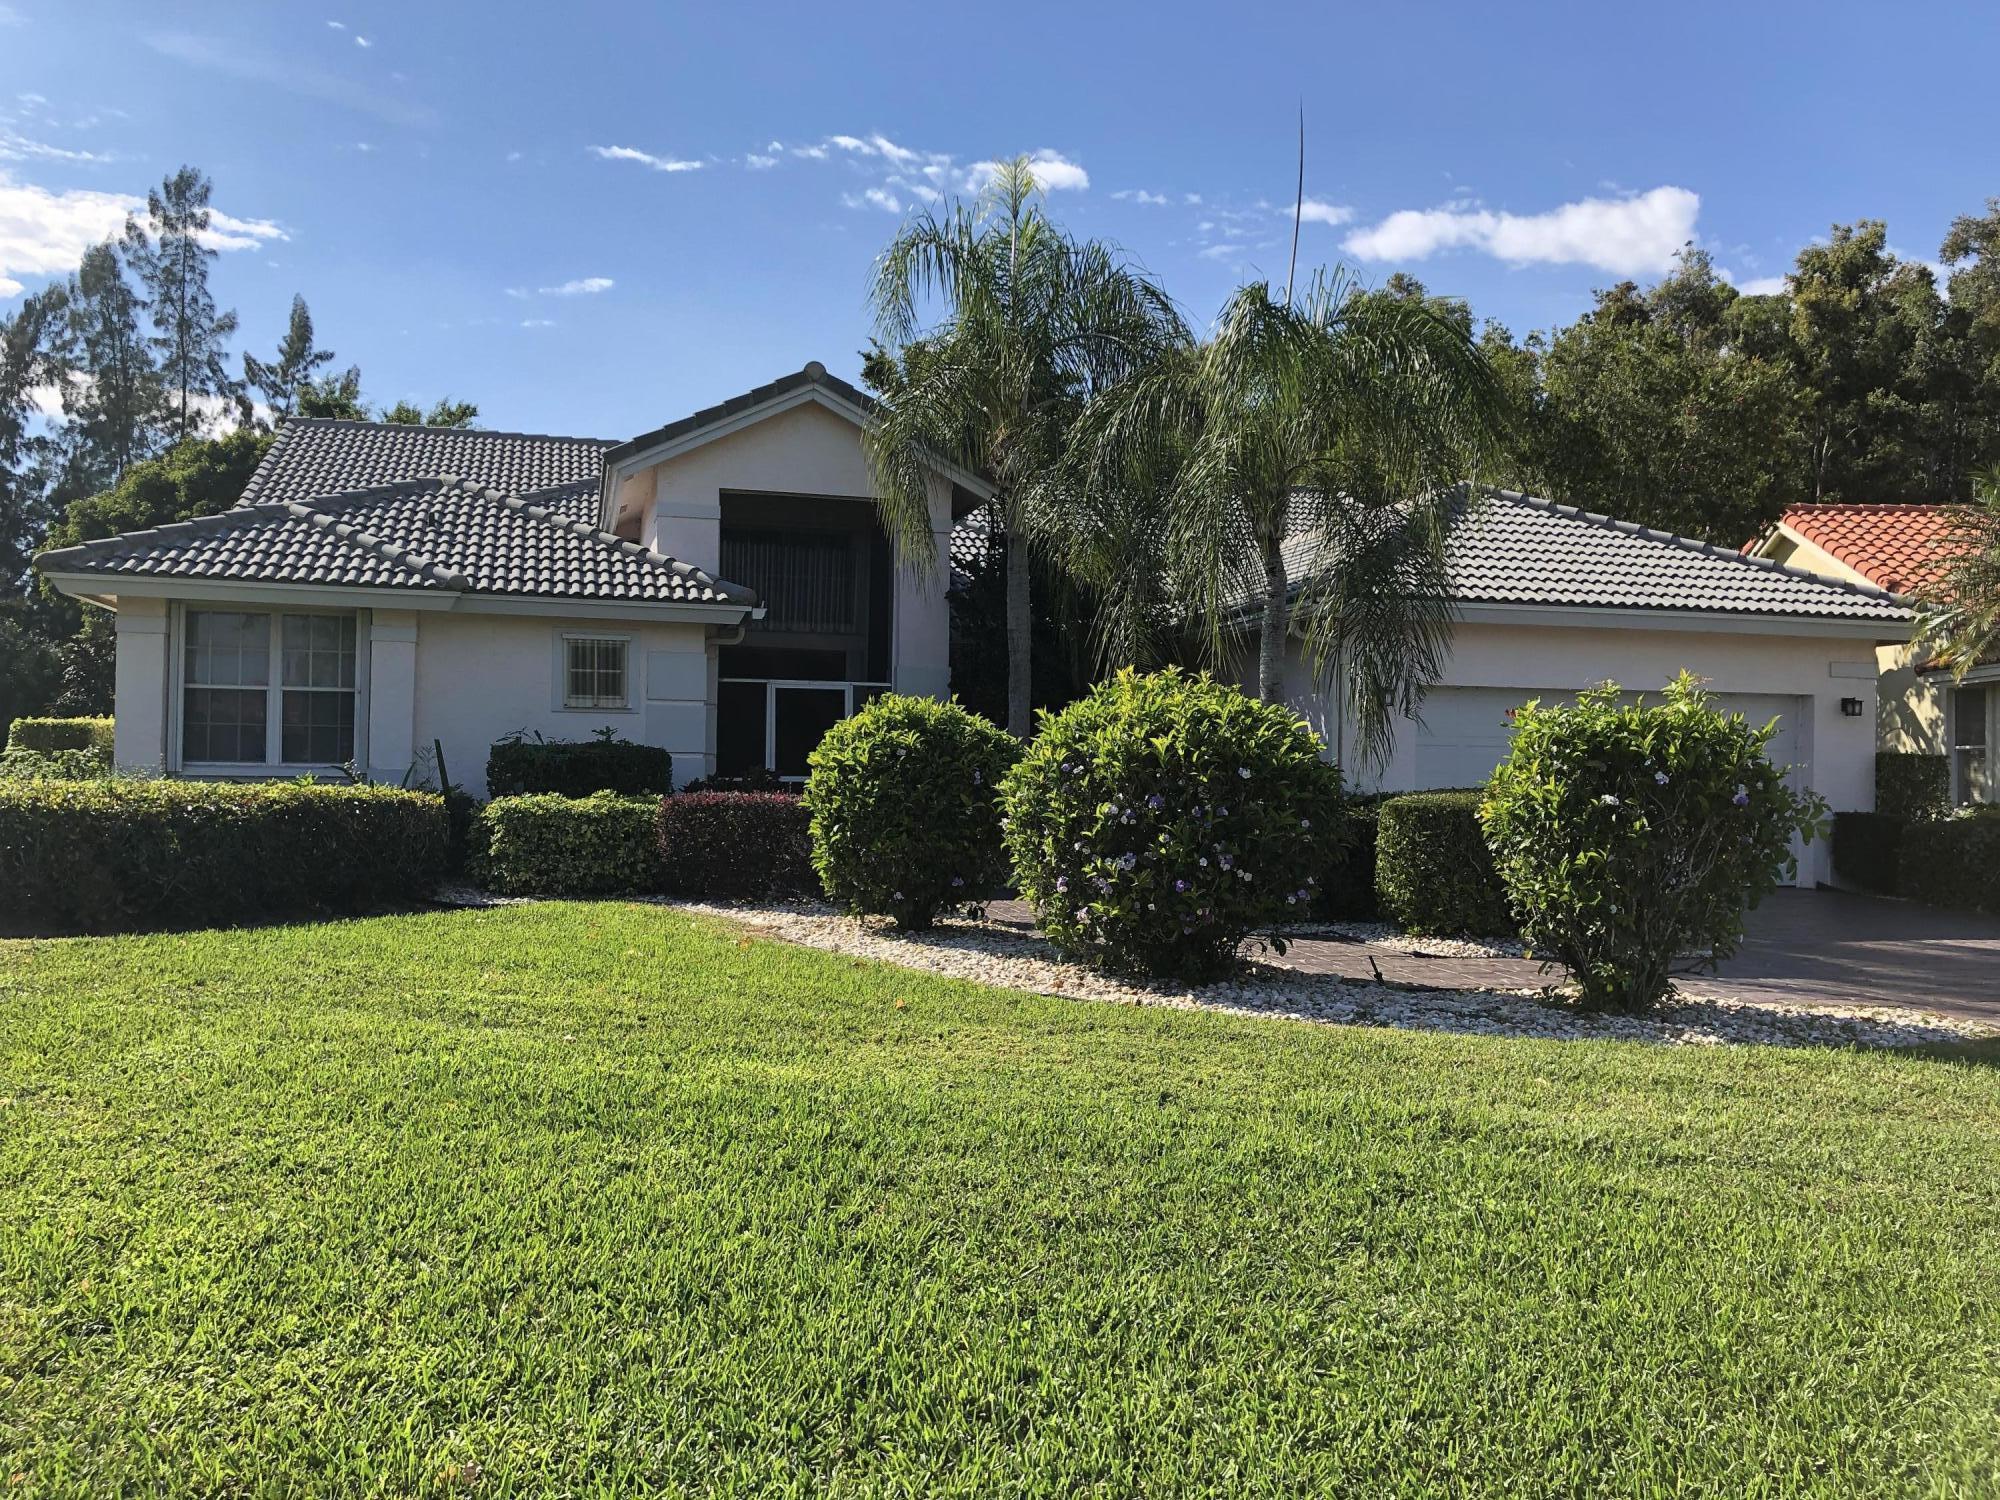 7852 Dorchester Road, Boynton Beach, Florida 33472, 3 Bedrooms Bedrooms, ,3 BathroomsBathrooms,Single Family,For Sale,Estates of Aberdeen,Dorchester,RX-10499208